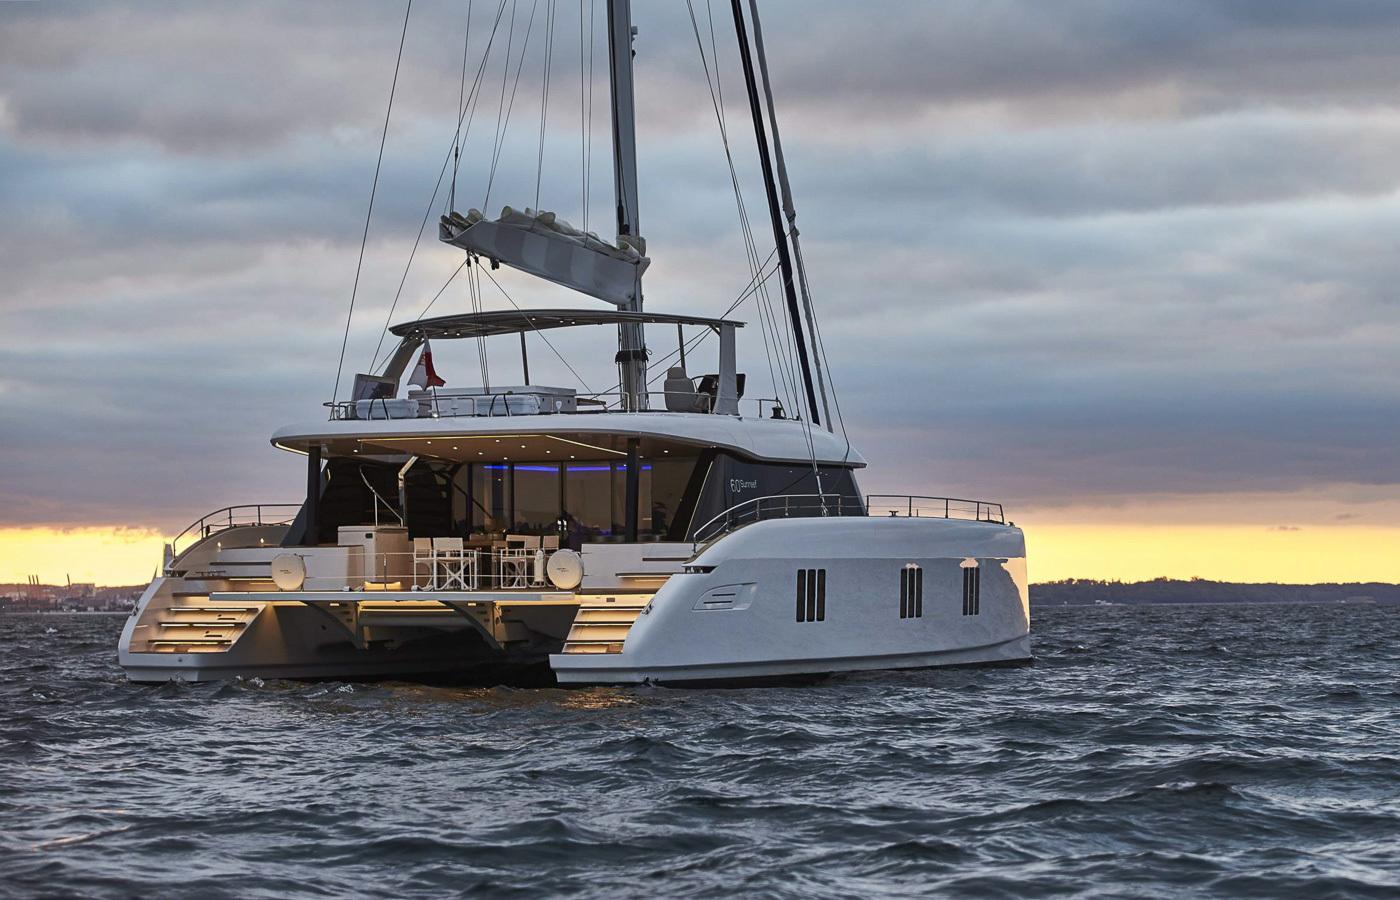 Sunreef Releases New Catamaran [Custom Yacht Design]